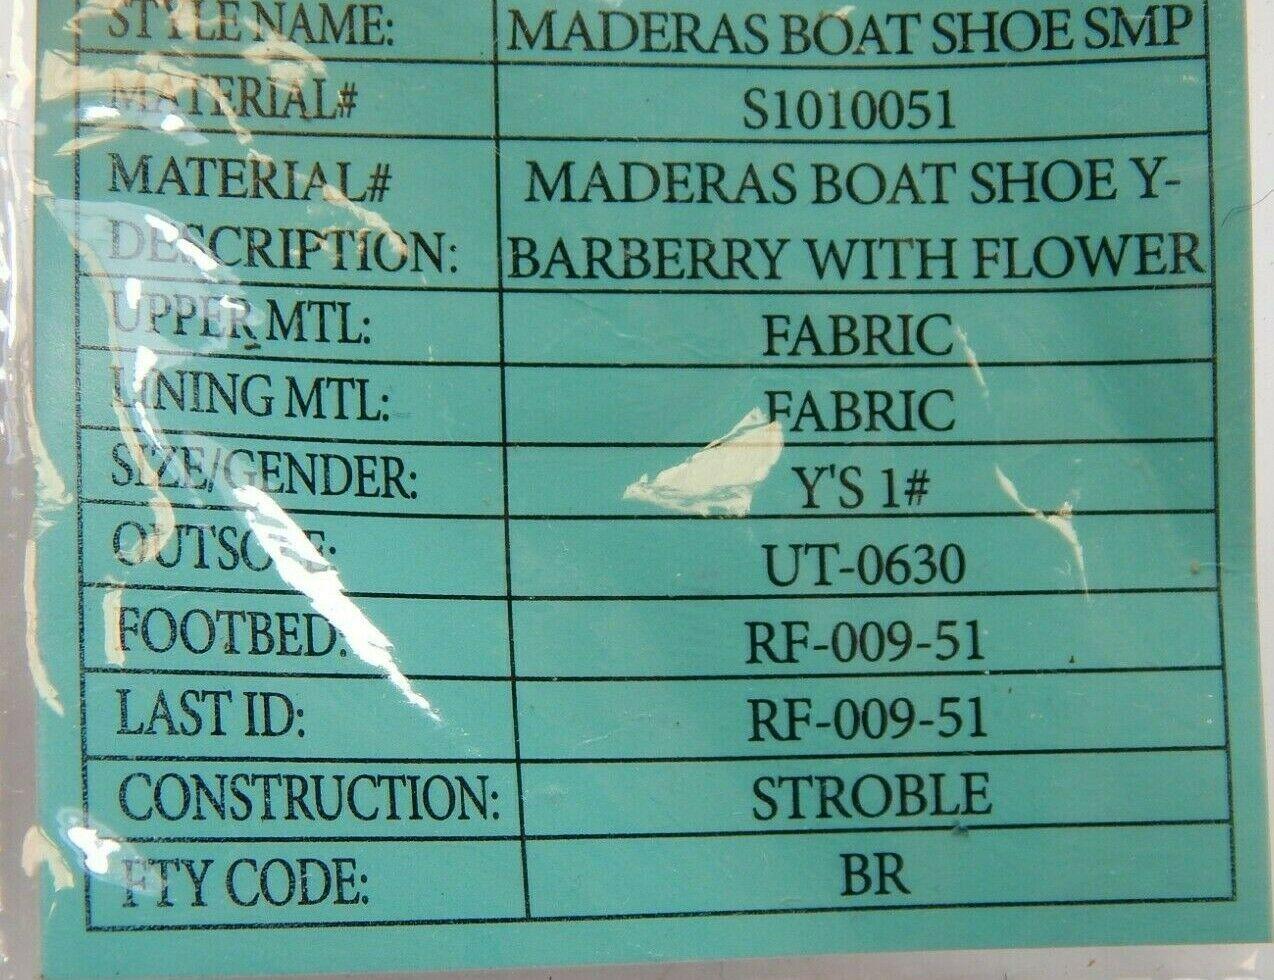 Keen Maderas Boot Größe US 1 M (Y) Eu 32/33 Jugend Kinder Turnschuhe S1010051